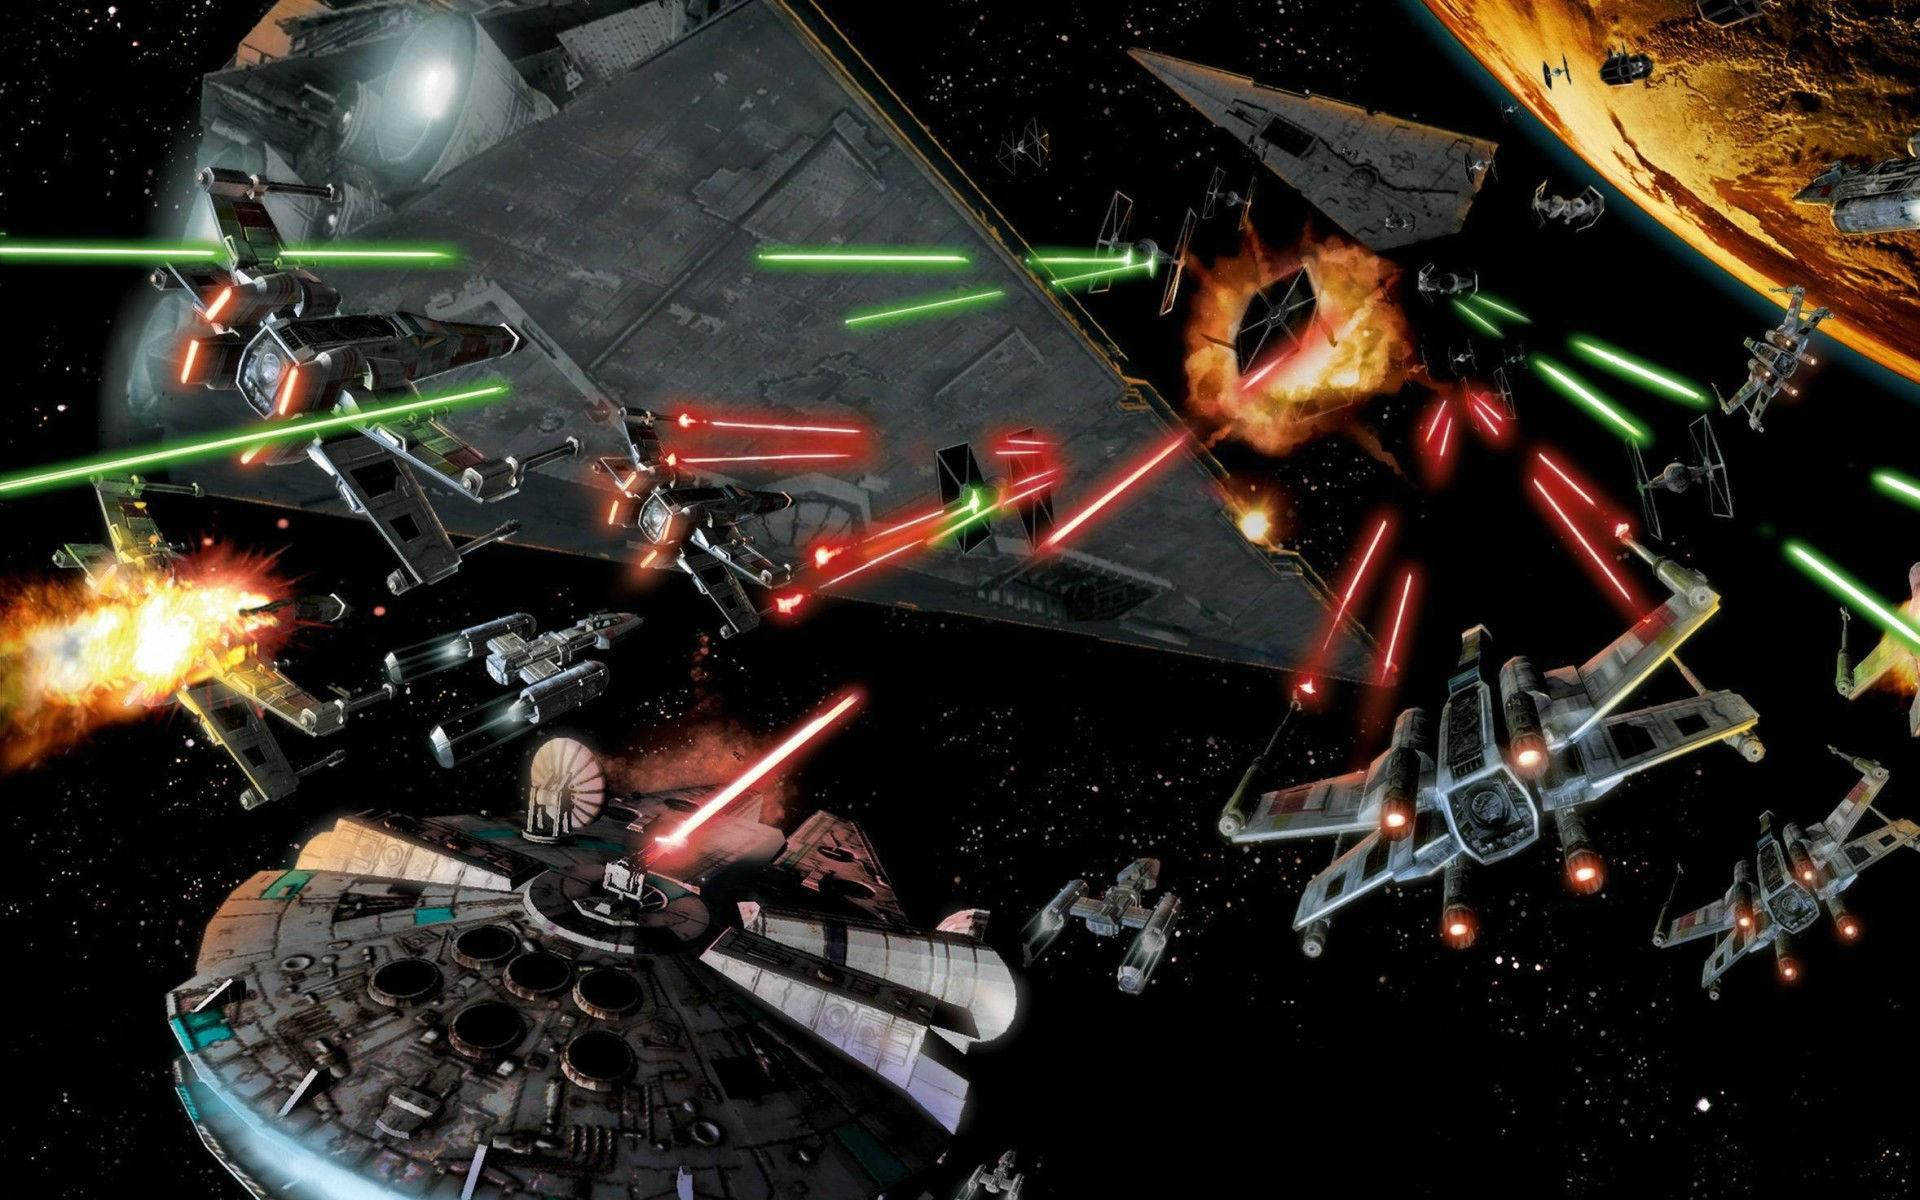 space Battle Star Wars Millennium Falcon Art Wallpapers HD 1920x1200